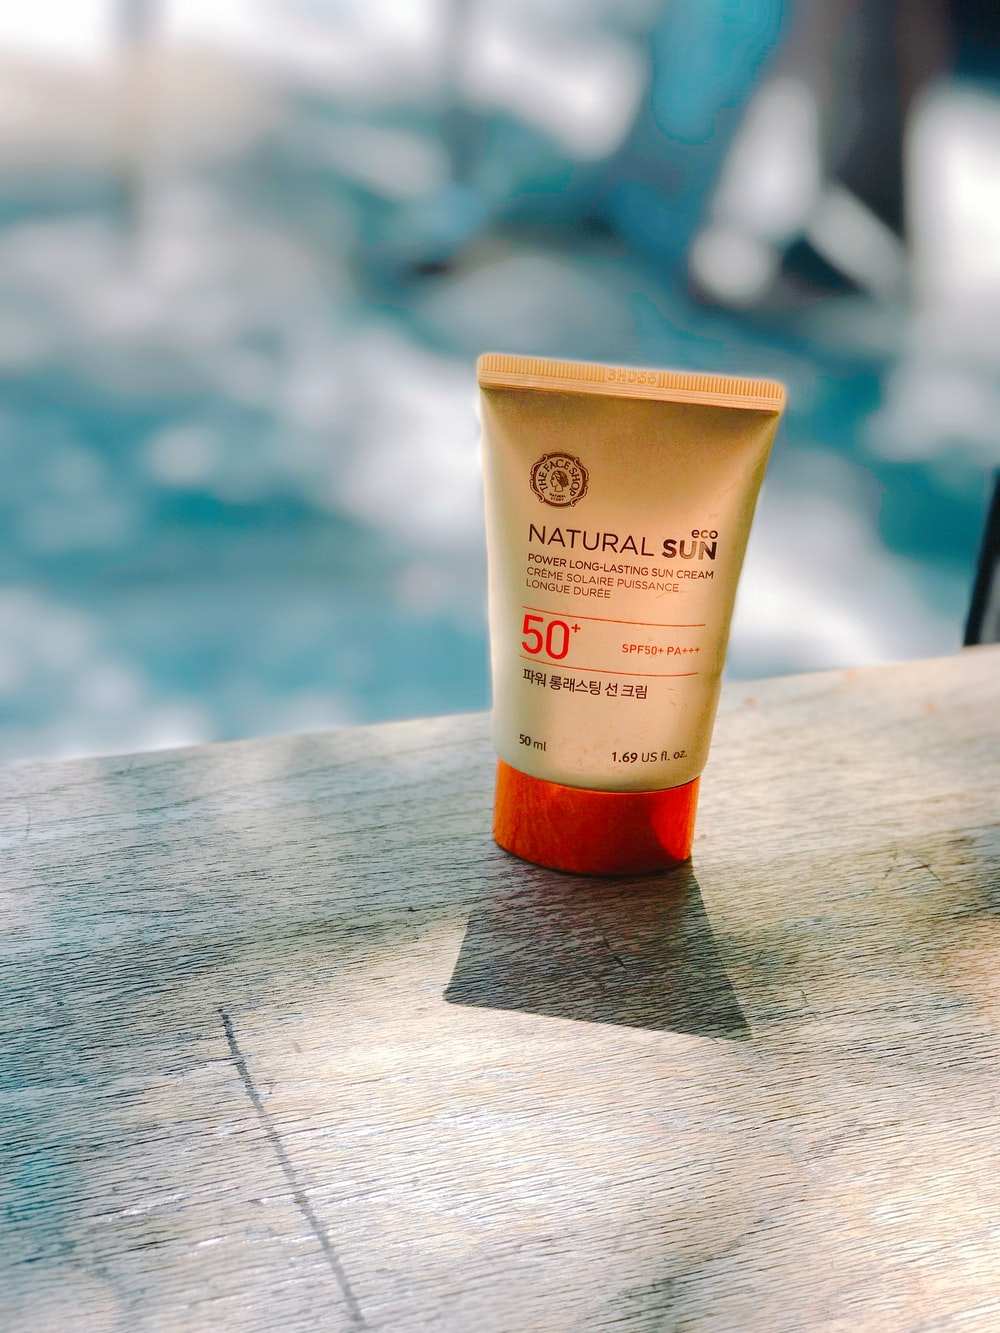 Natural Sun cream bottle on table